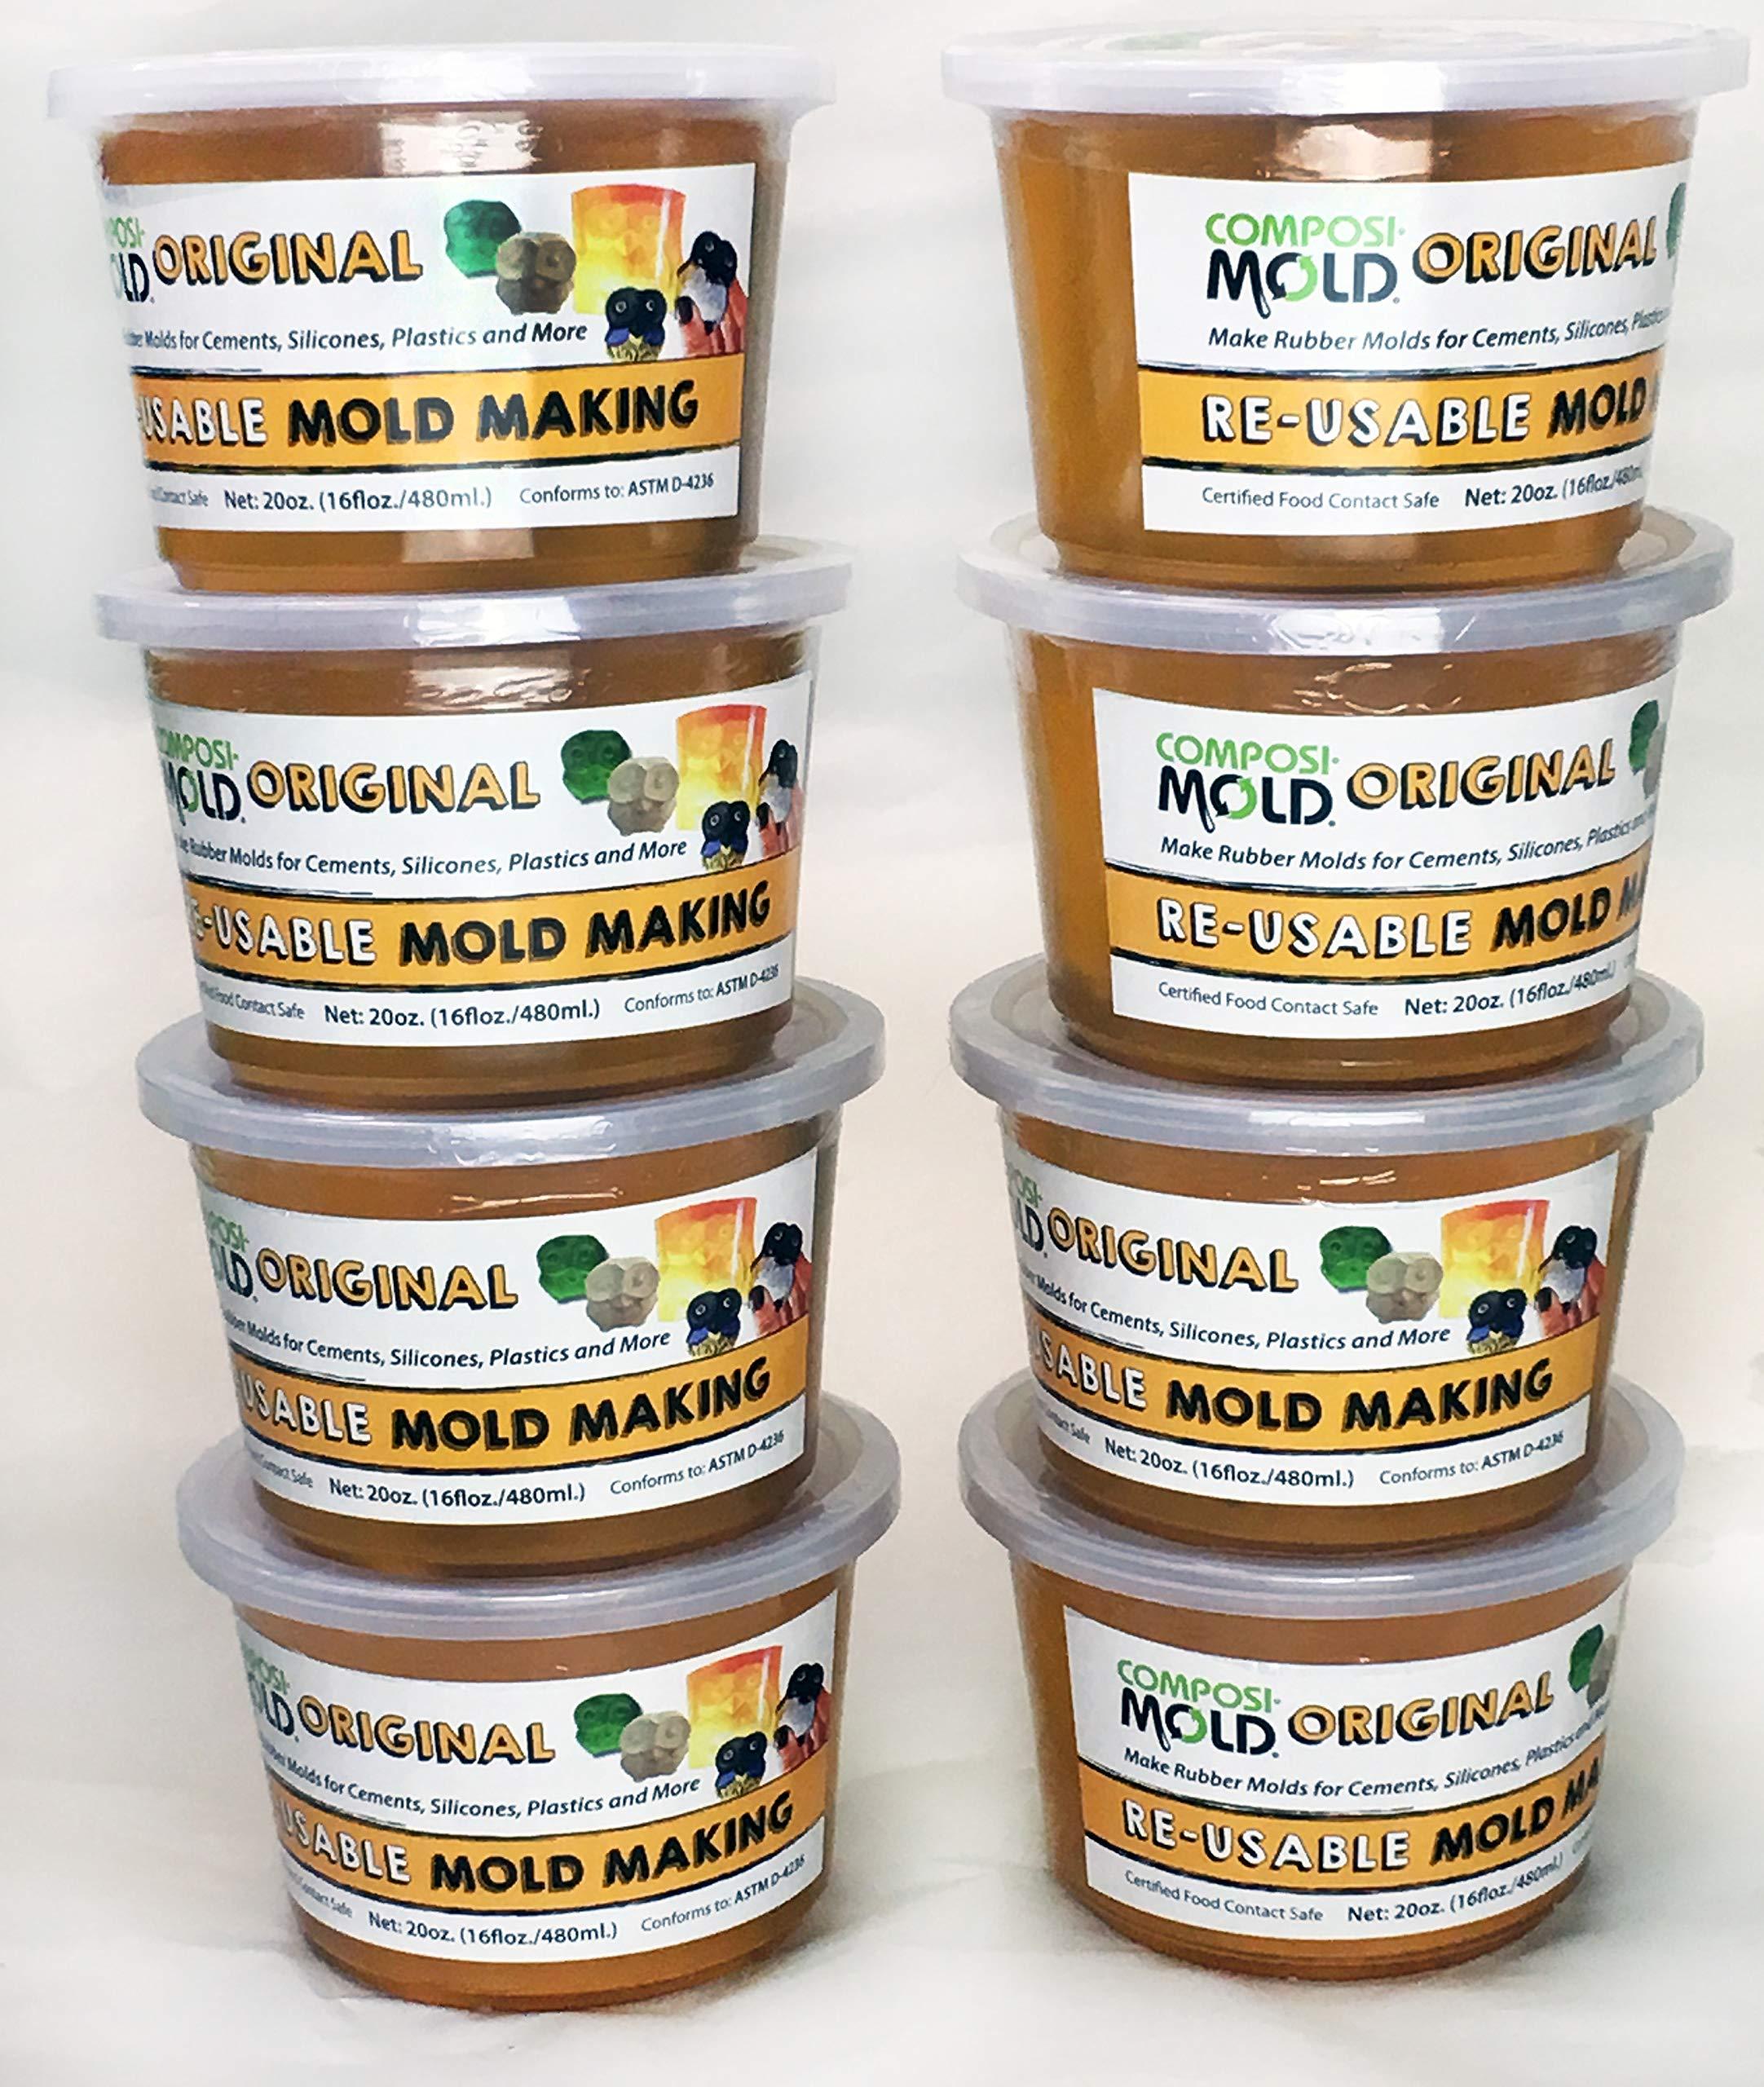 ComposiMold Re-usable MoldMaking Material (Original) 10 lbs. (8x20oz)